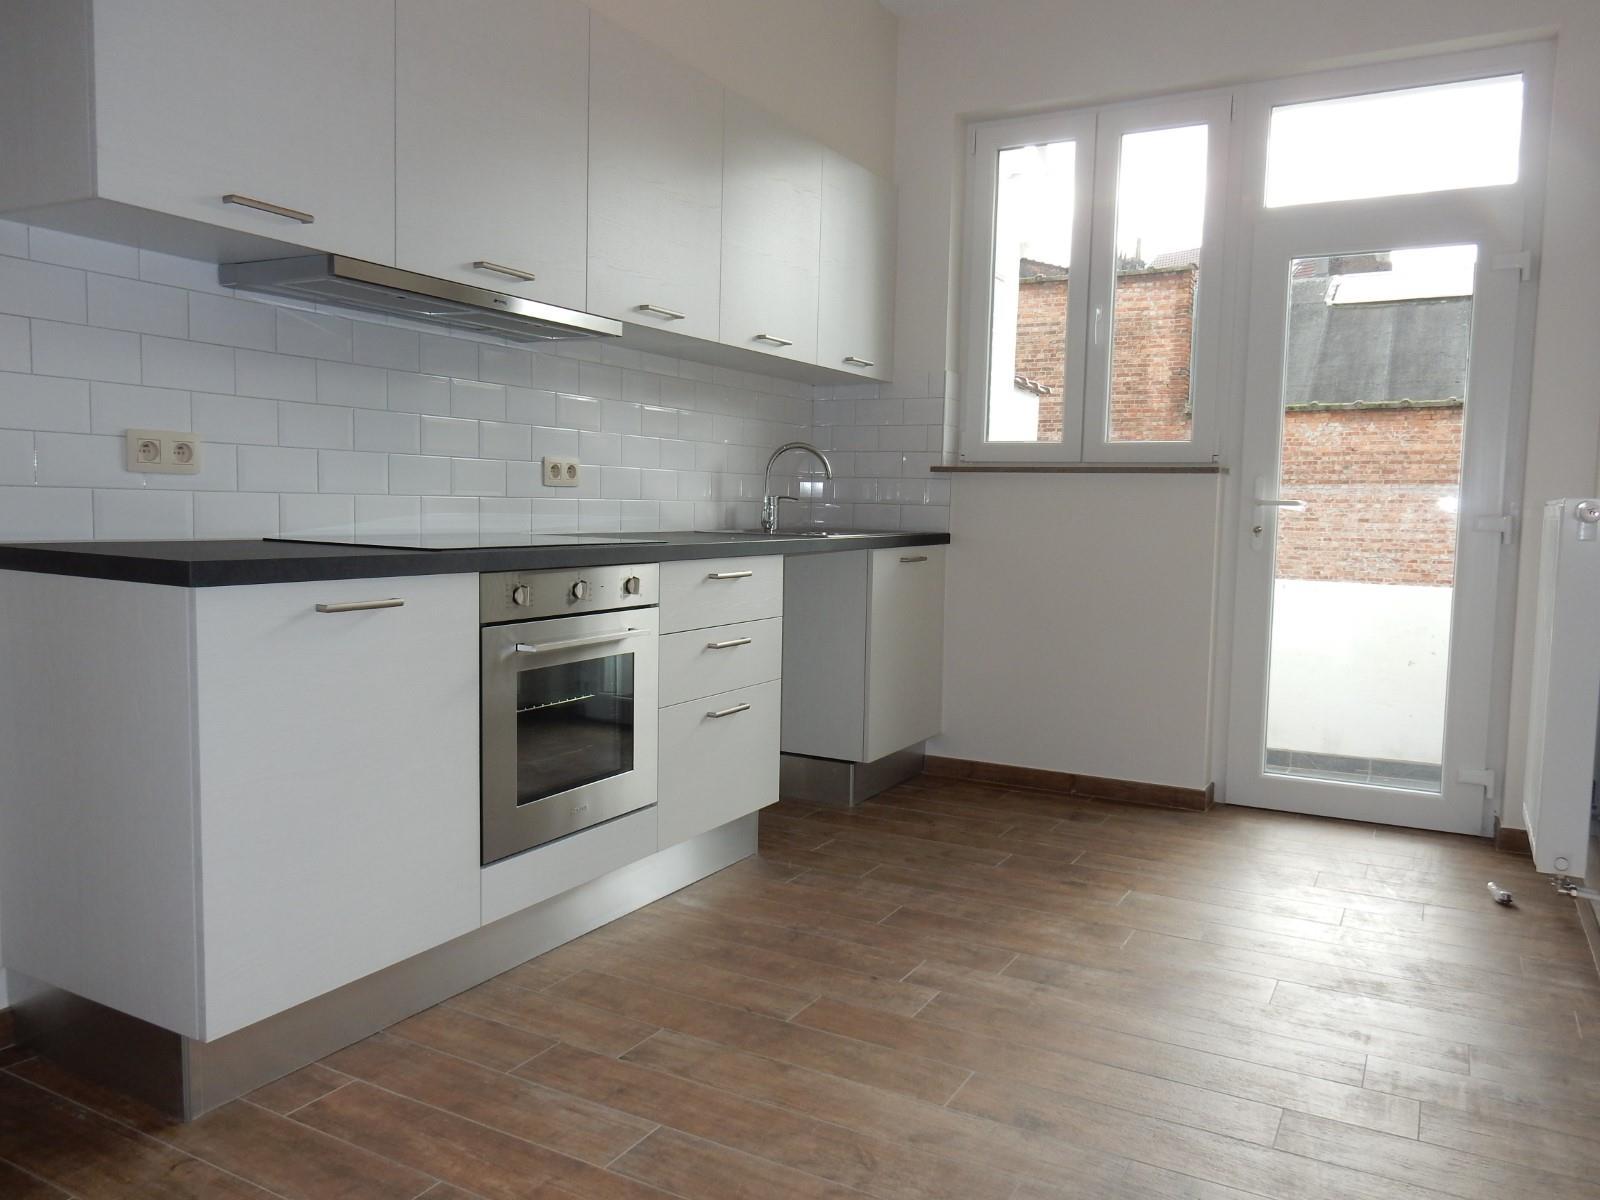 Appartement - Molenbeek-Saint-Jean - #3532282-3